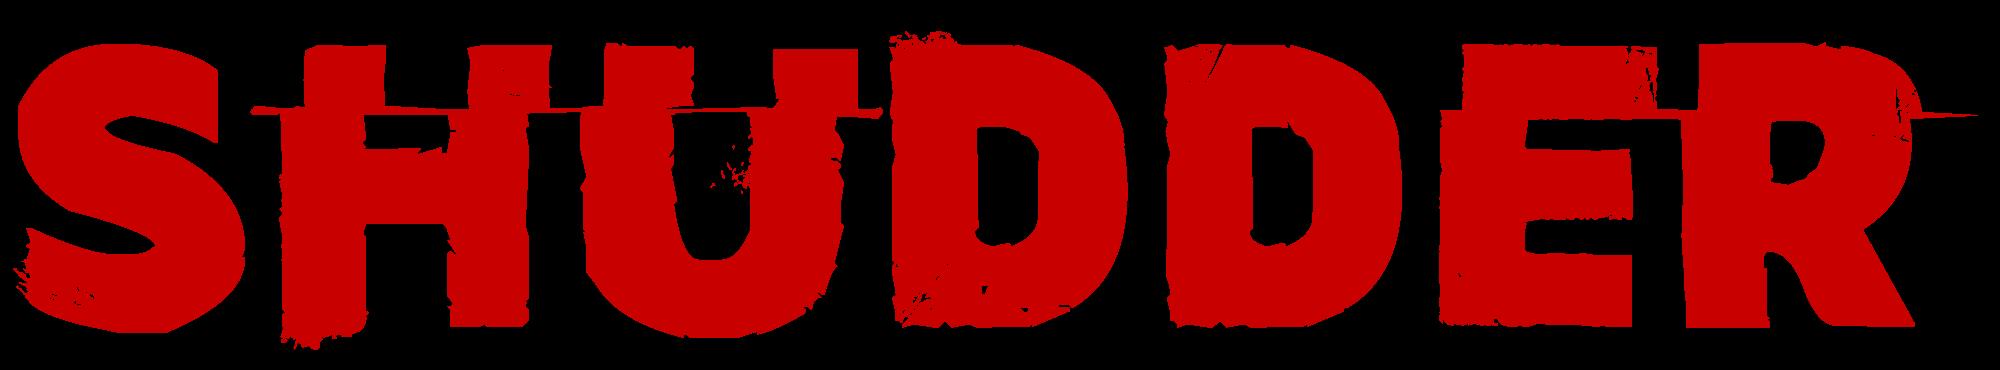 logo-1531254869-1e5f19d456a419edee7306ed8540d093.png